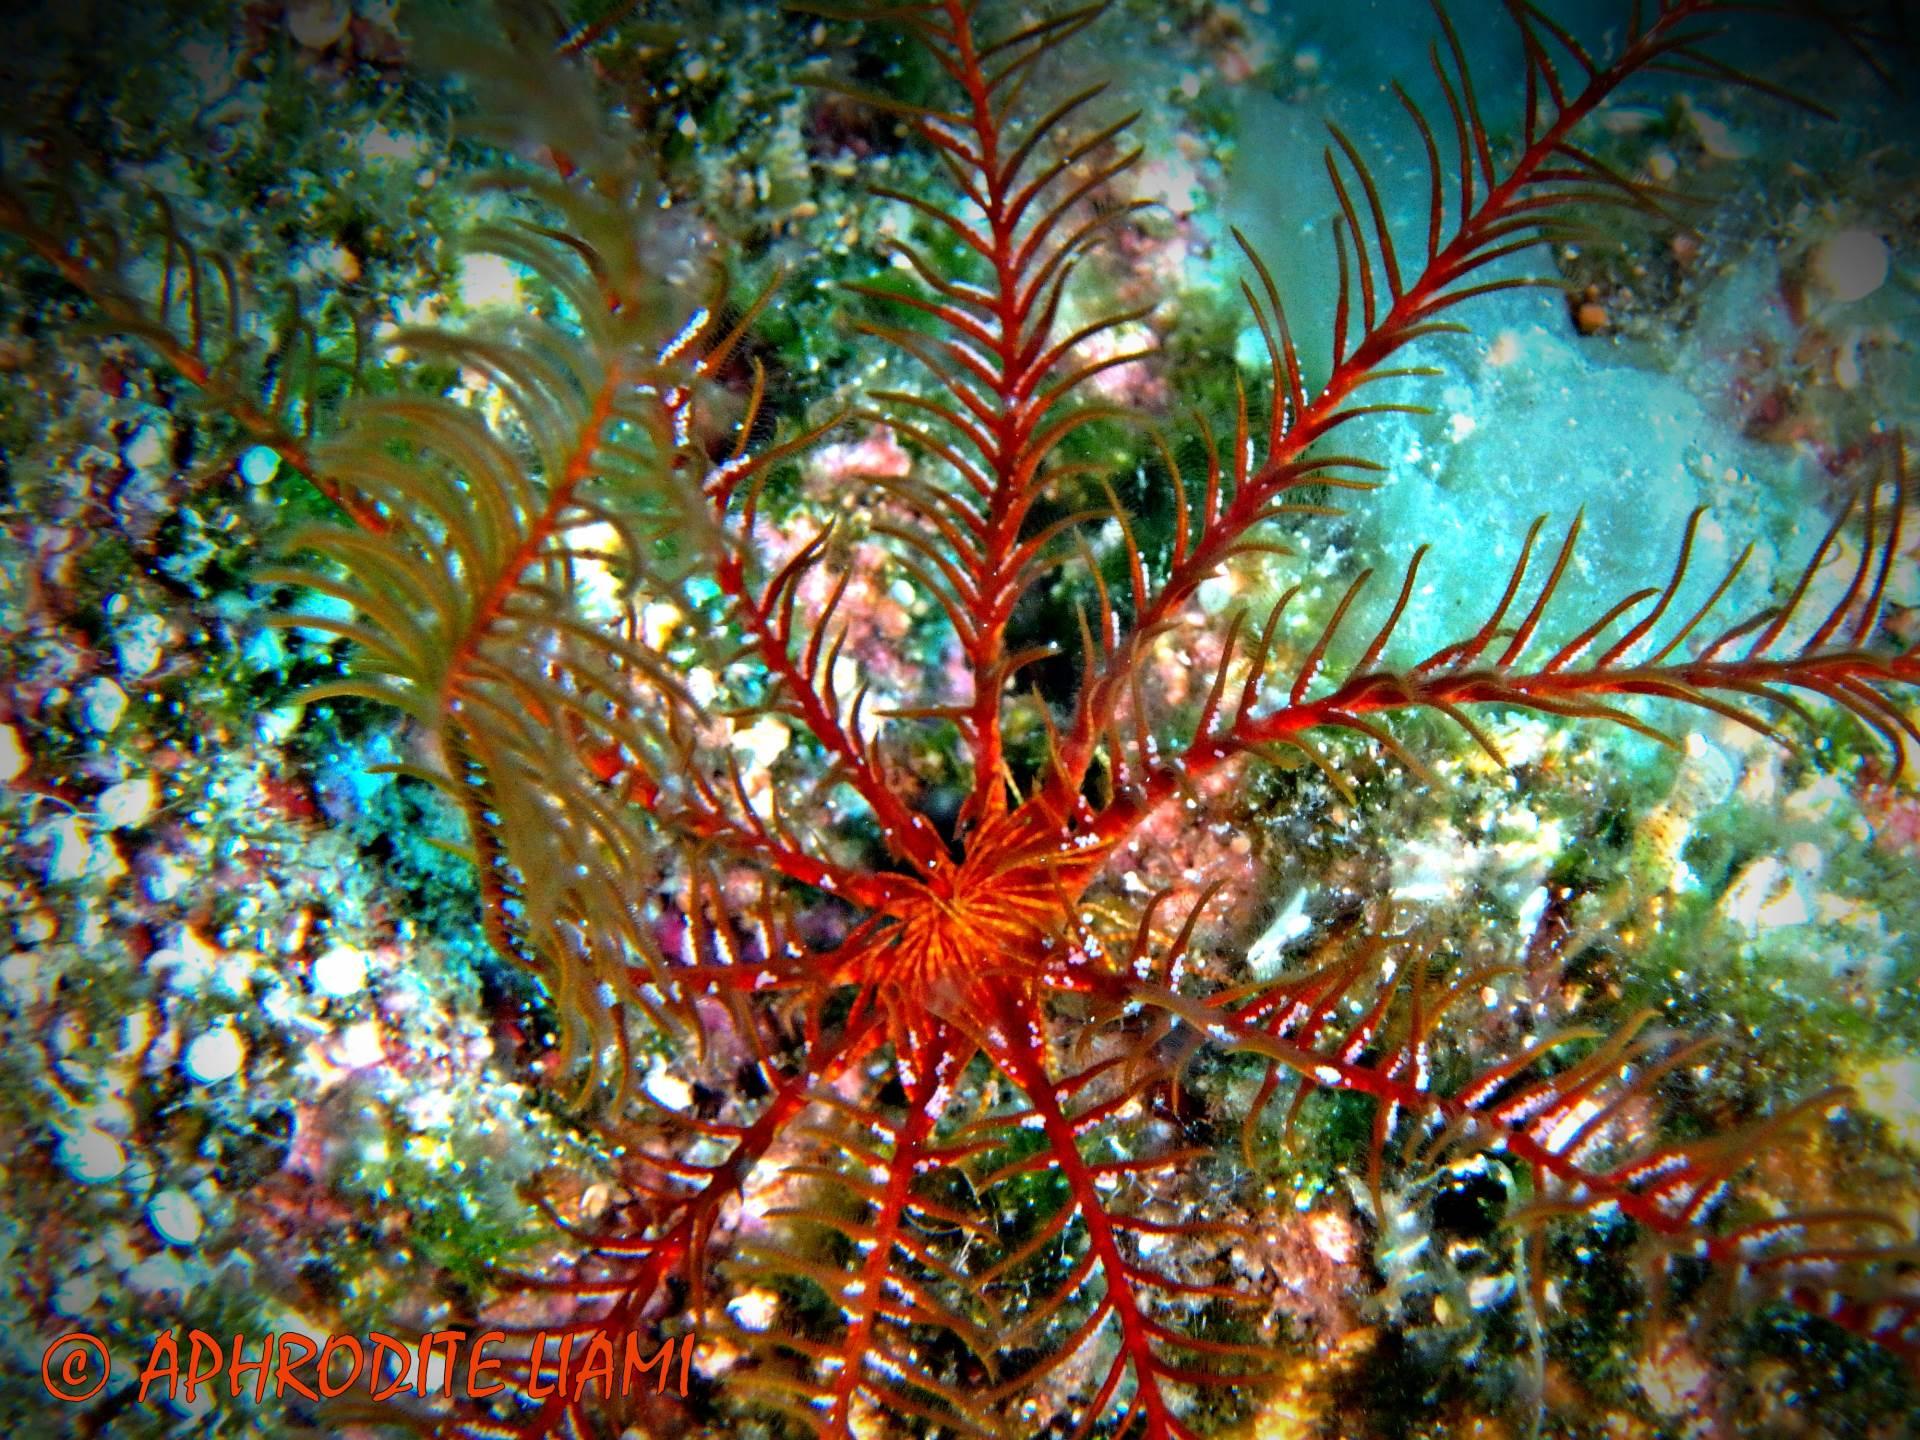 #scubadiving #scuba #diving #marinelife #sealife #sea #aegeansea #star #seastar #featherseastar #starfish #giantdoris #crab #fish #worm #flabellina #animal #kos #kosisland #greece #hellas #underwater #underwaterphotography #holiday #ecology #enviroment #liamisdivecentre